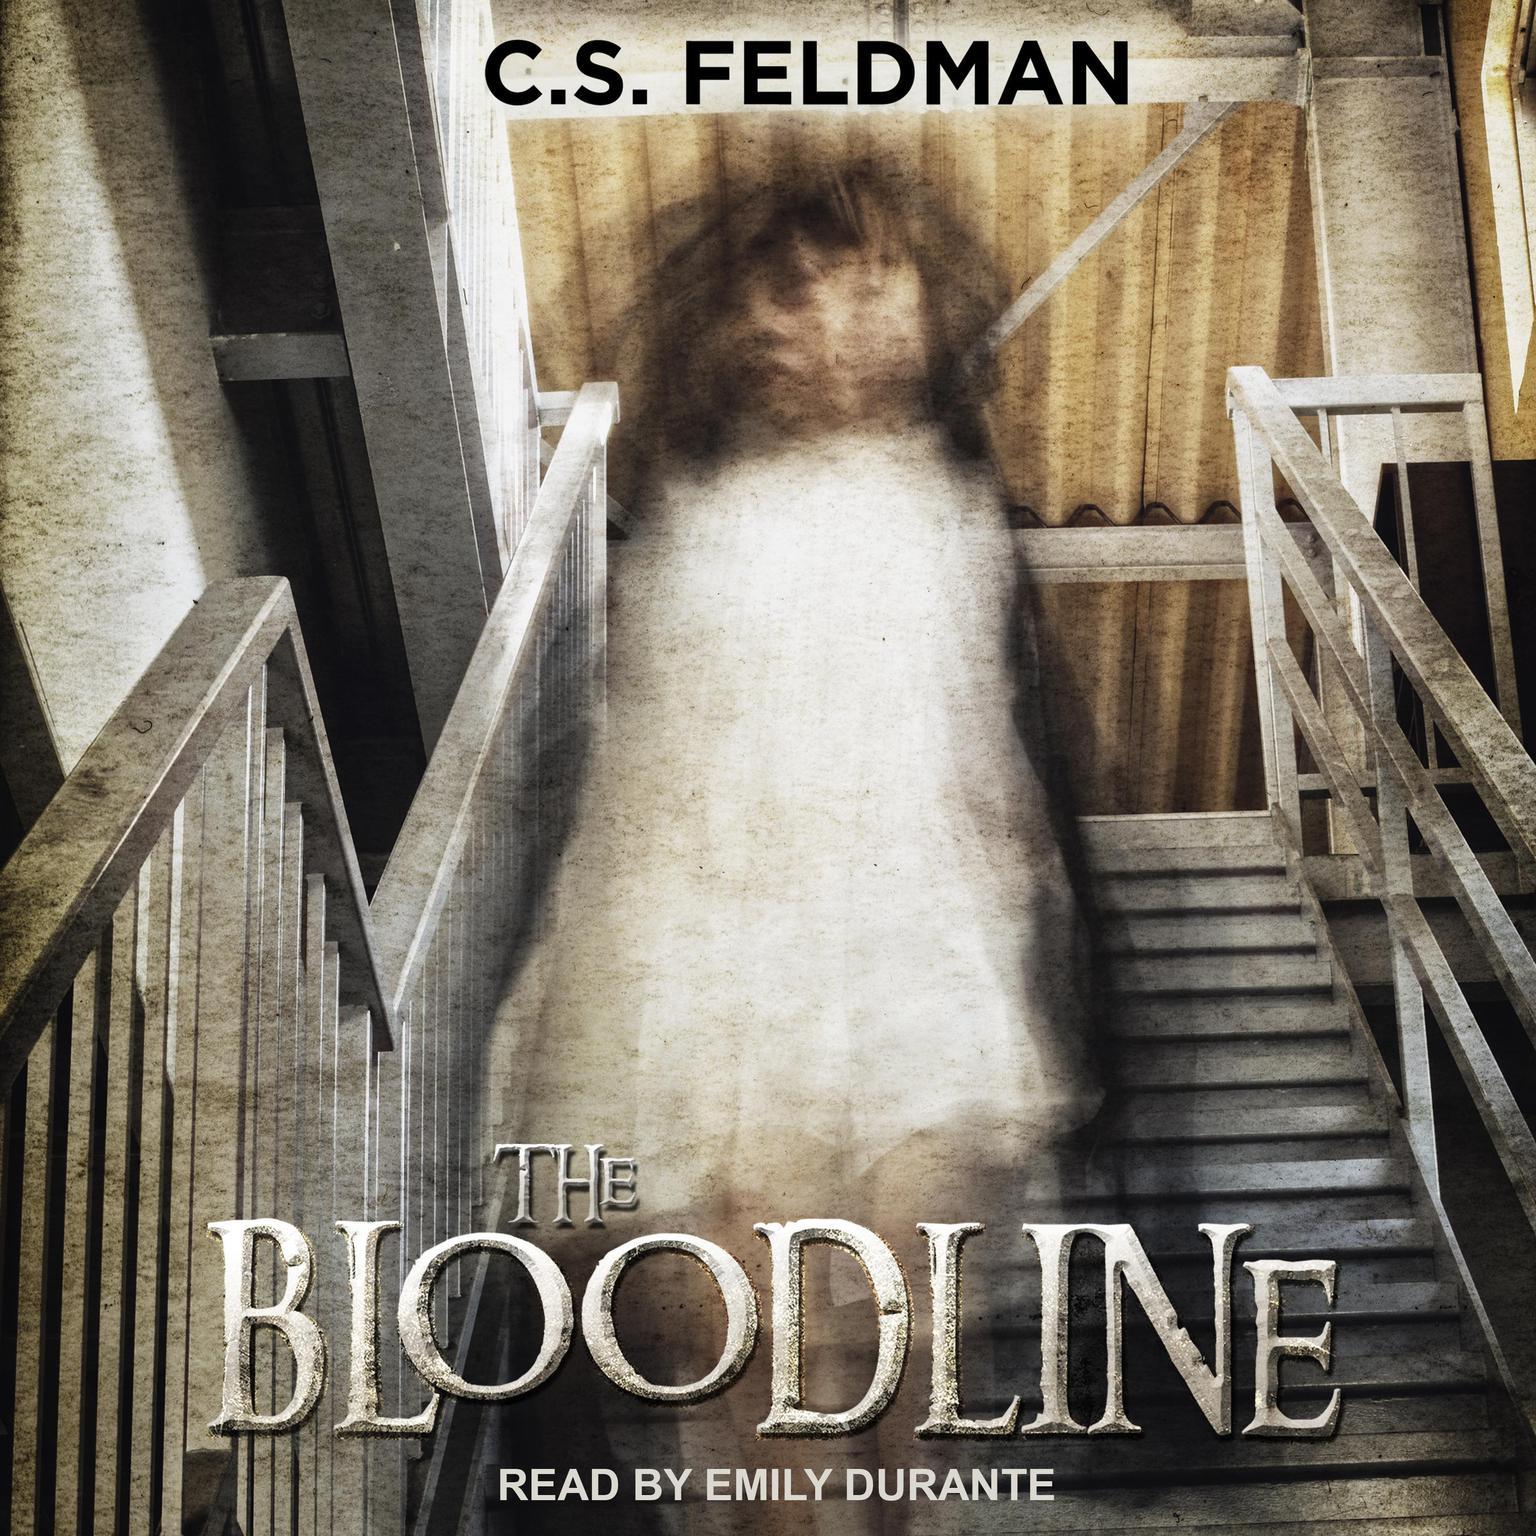 The Bloodline Audiobook, by C.S. Feldman